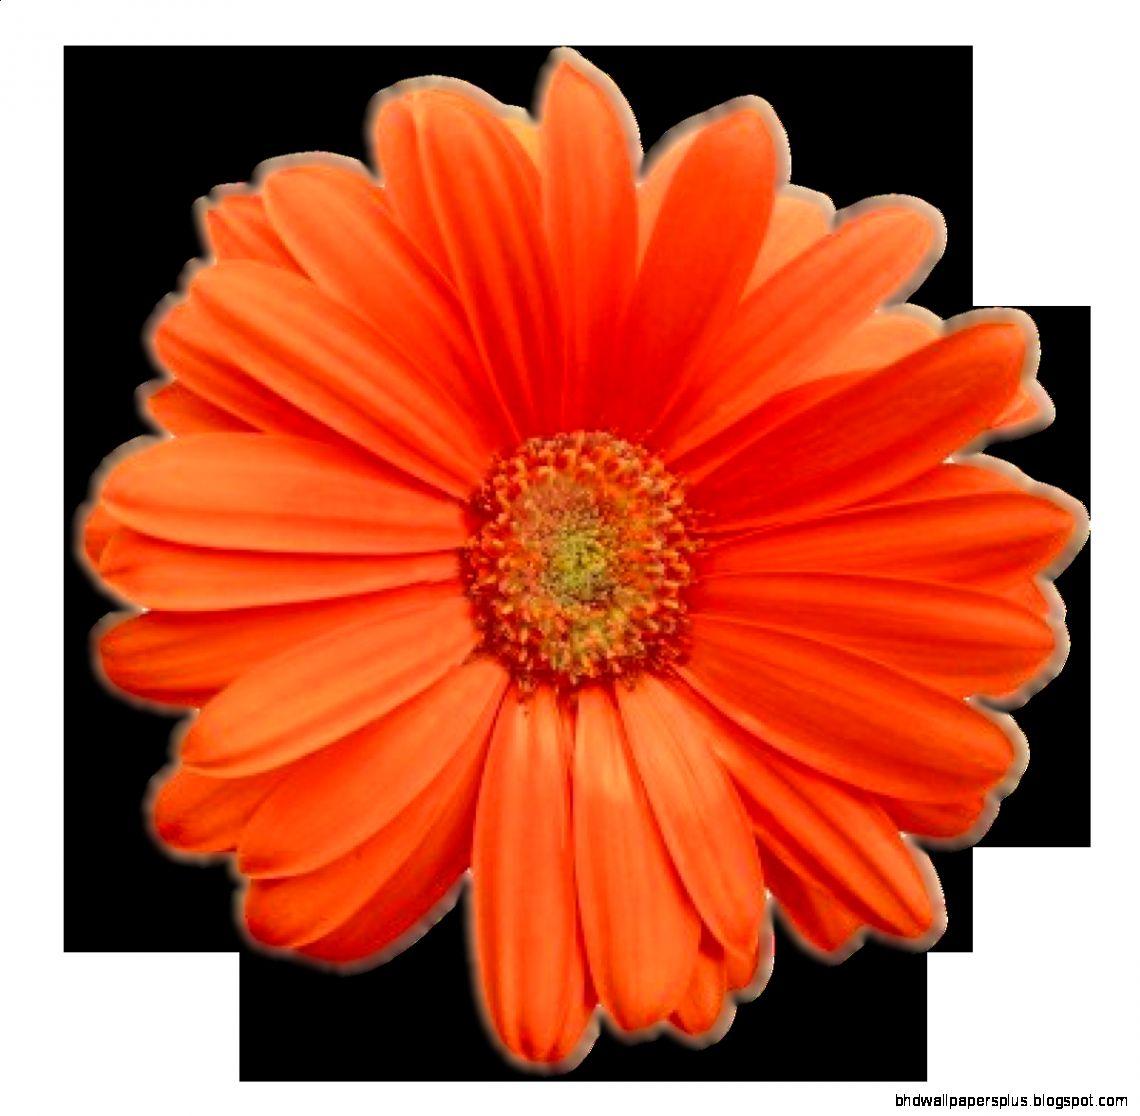 Flower Power  Revitalize Not Militarize